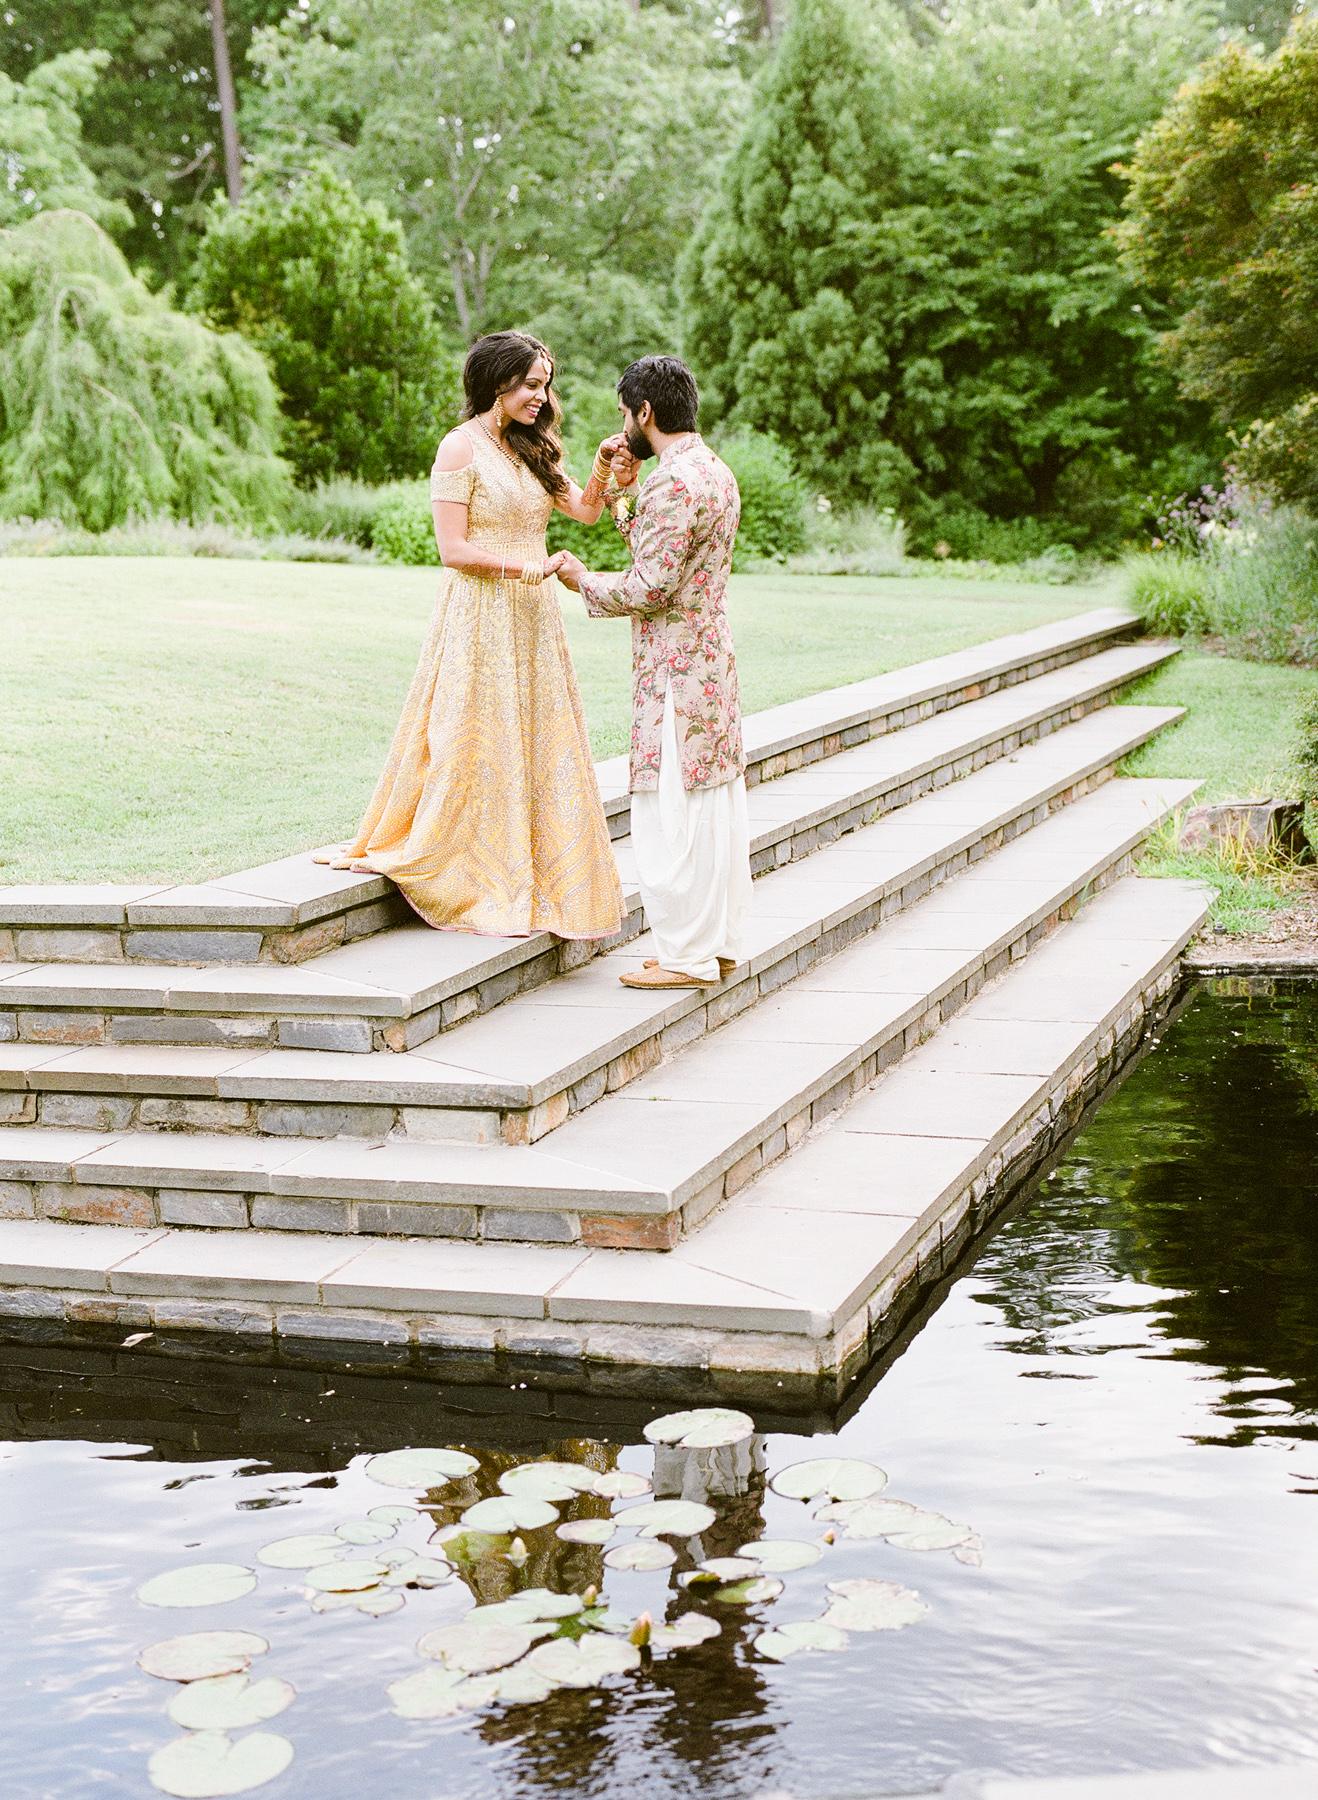 Indian-Wedding-Film-Photographer-06.jpg